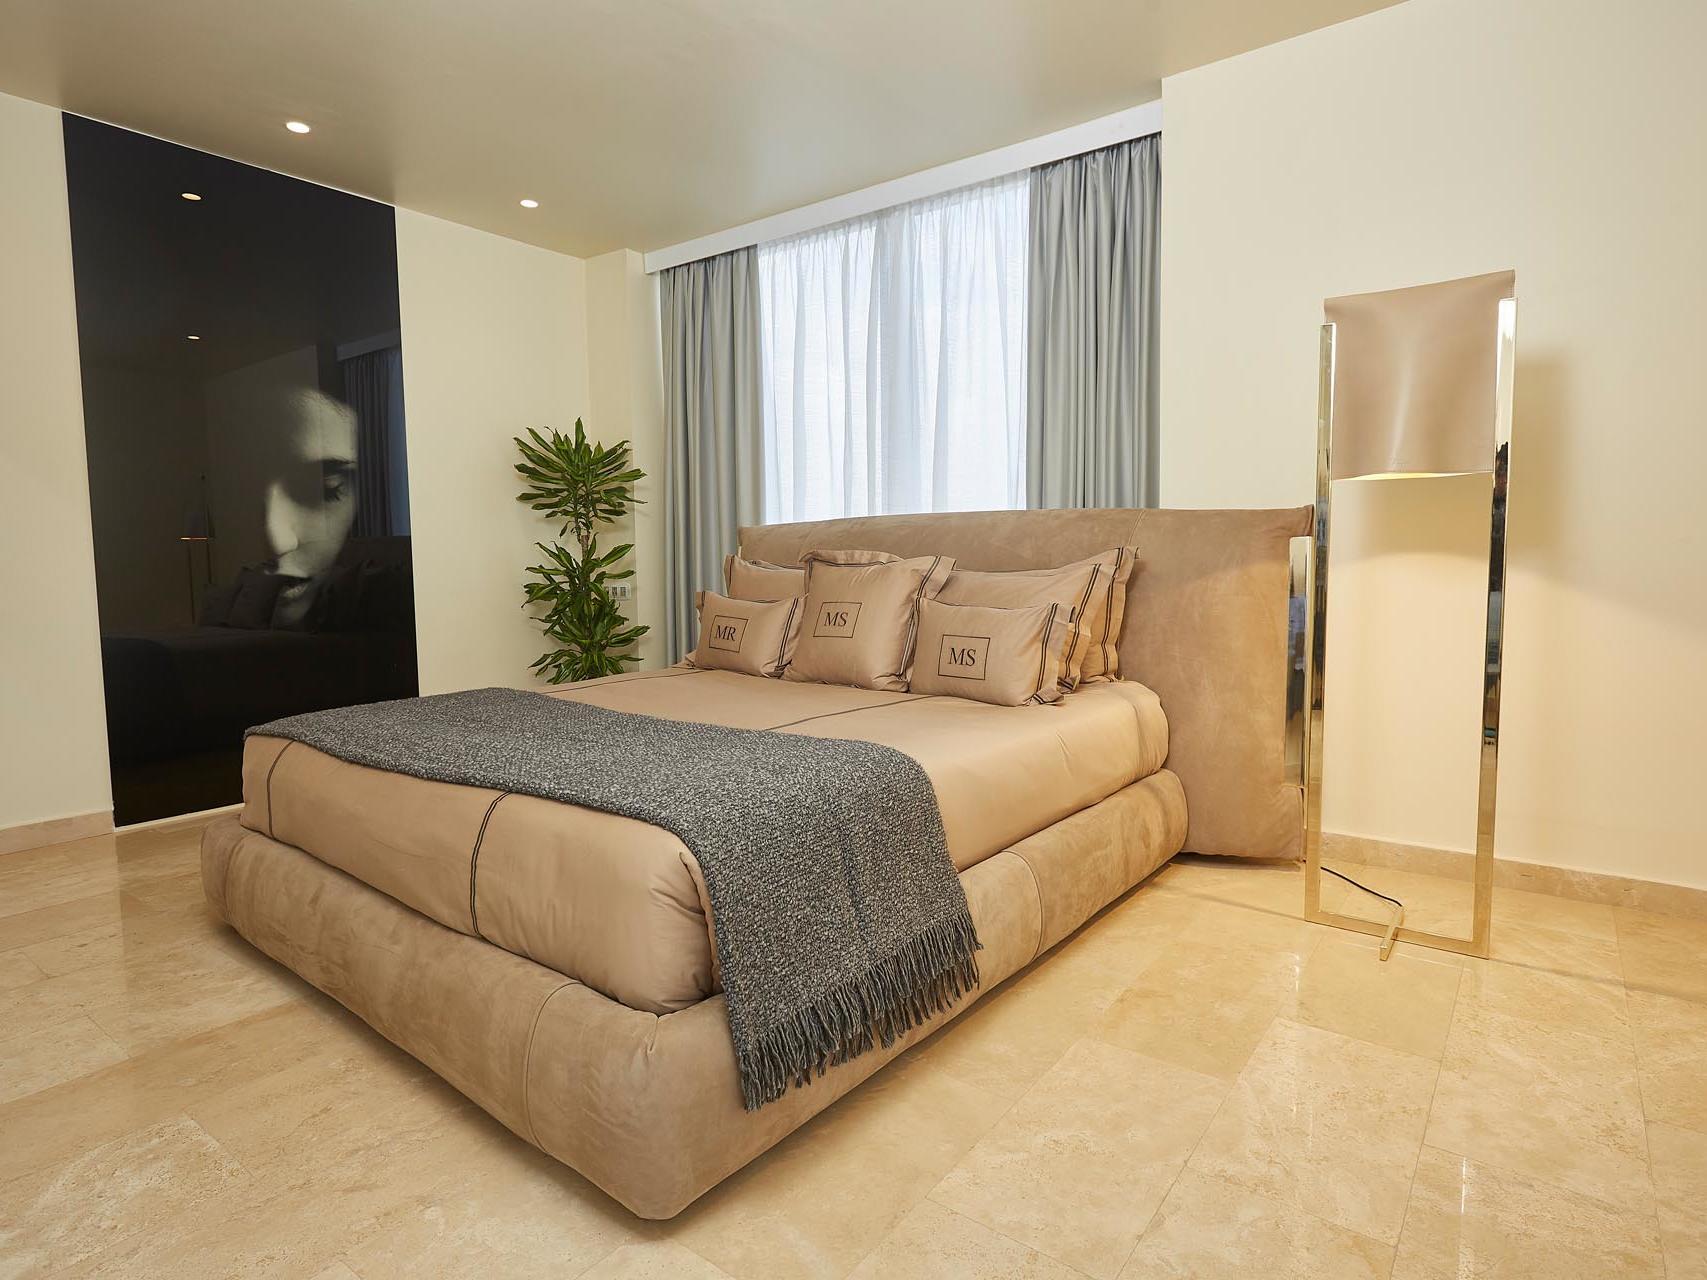 Three bedroom presidential penthouse suite at Kwarleyz Residence in Accra